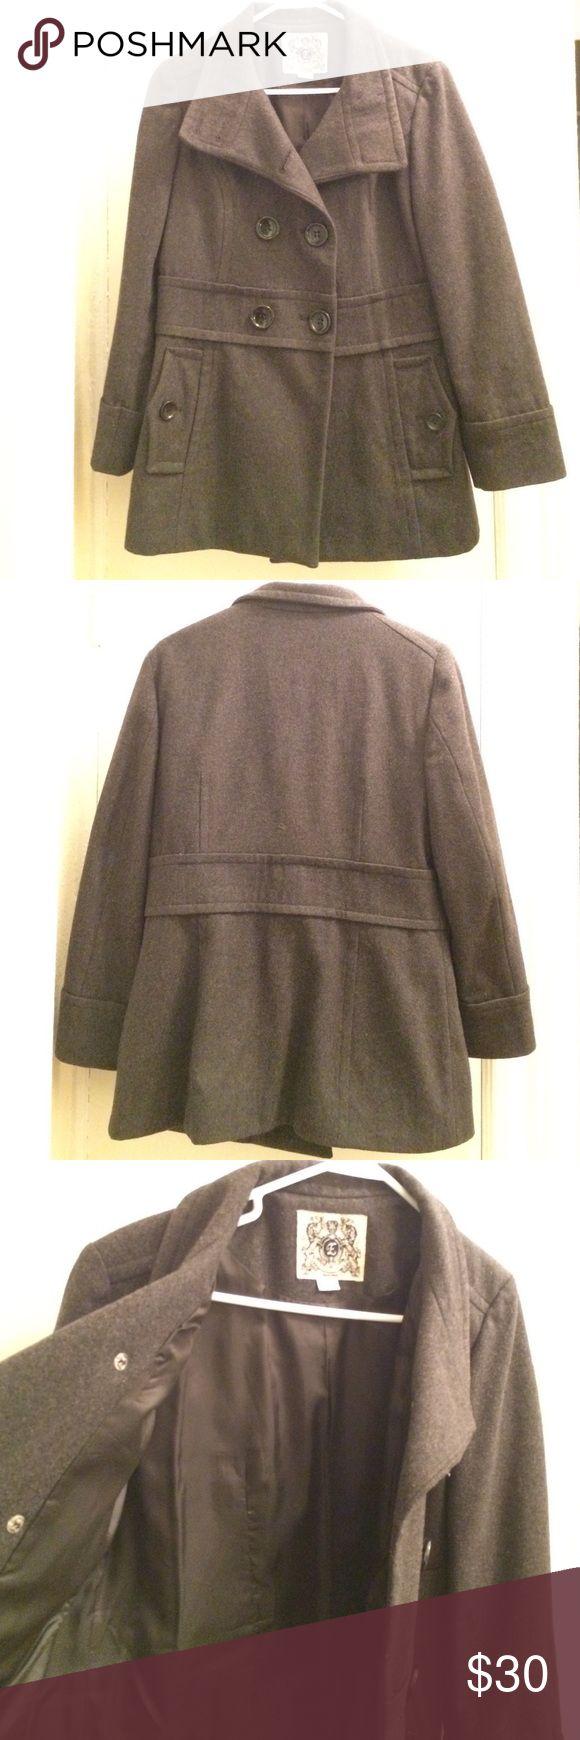 Dark grey pea coat Like new, fully lined dark grey pea coat. Perfect for fall! ESPRIT Jackets & Coats Pea Coats